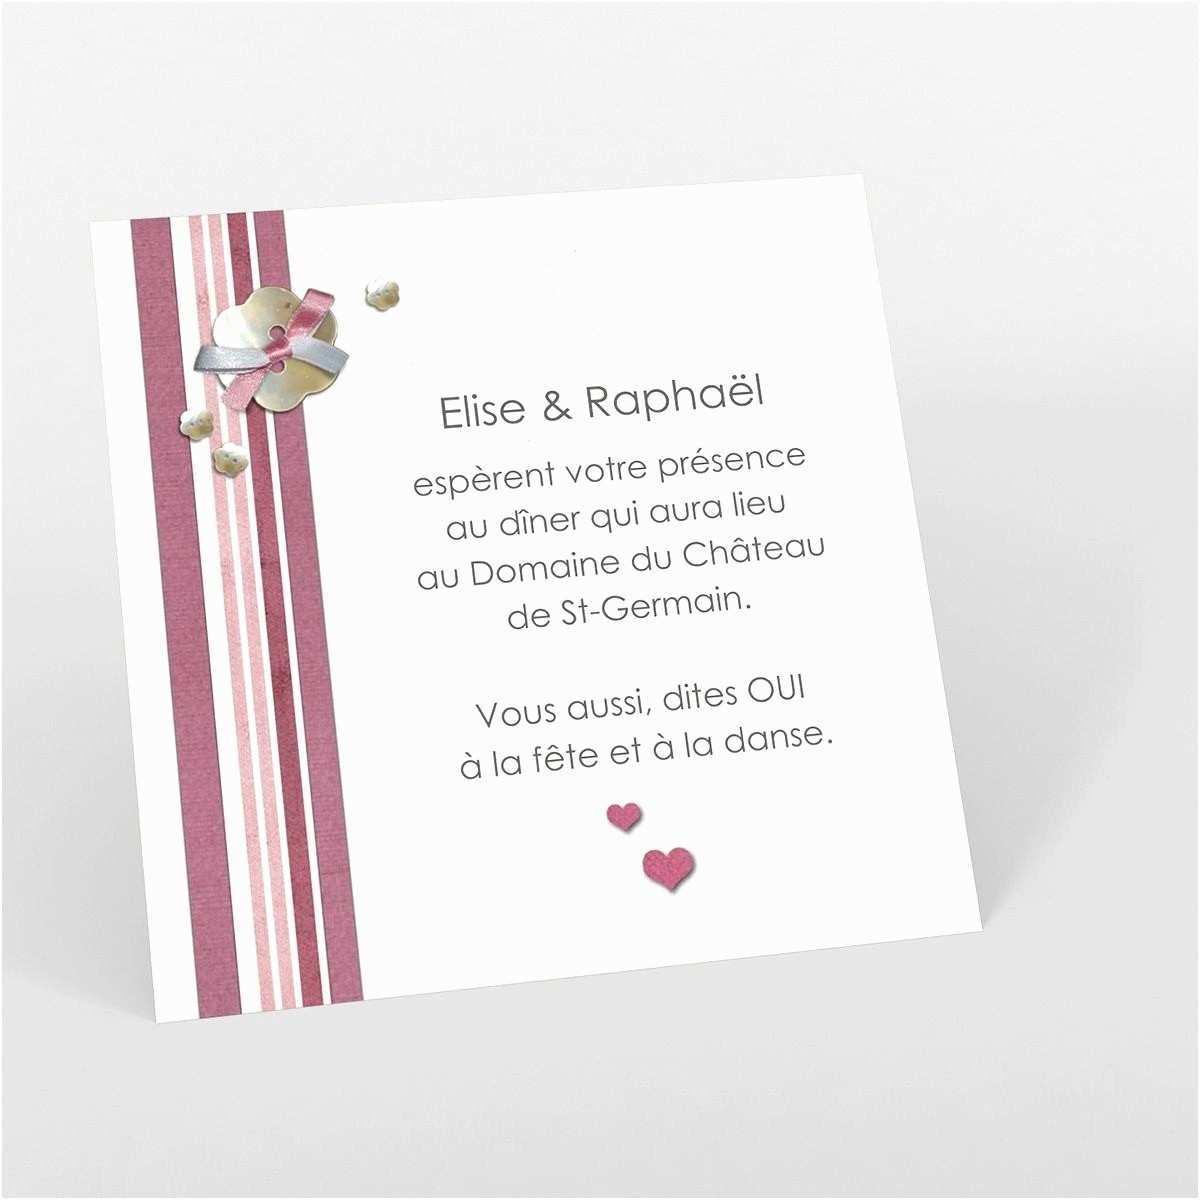 Texte remerciement invitation anniversaire 50 ans de mariage - Elevagequalitetouraine